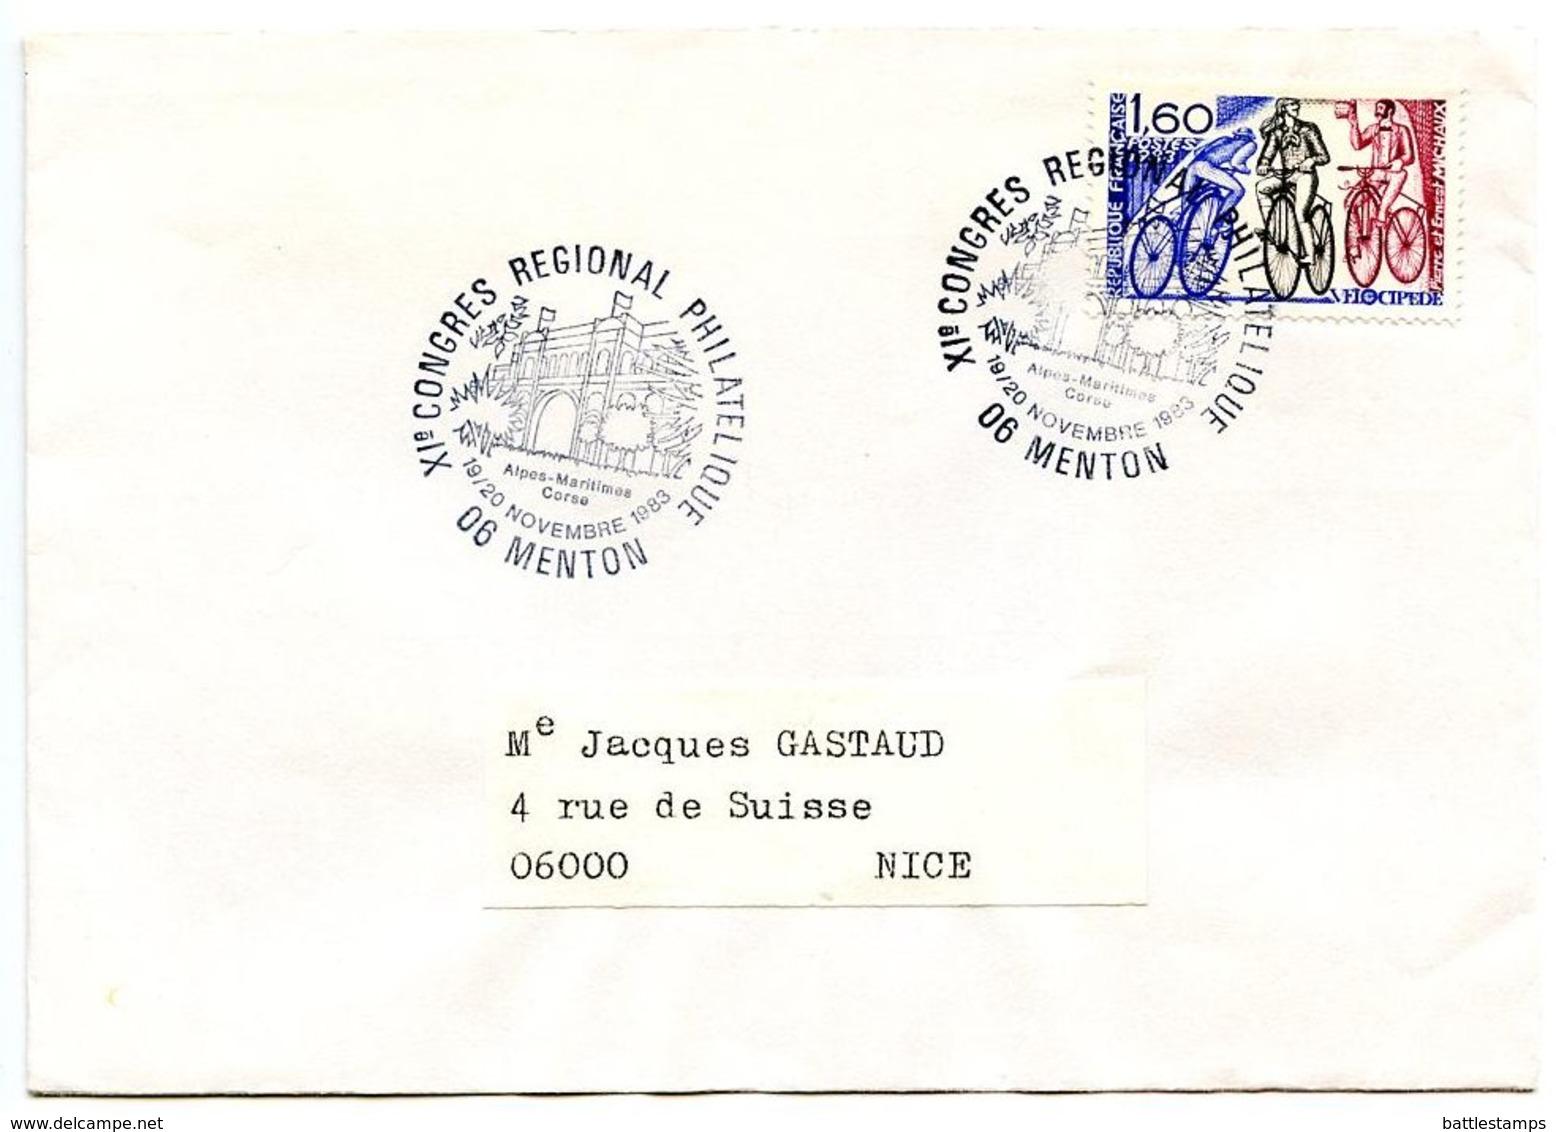 France 1983 Philatelic Cover Menton, XI Regional Philatelic Congress - Commemorative Postmarks